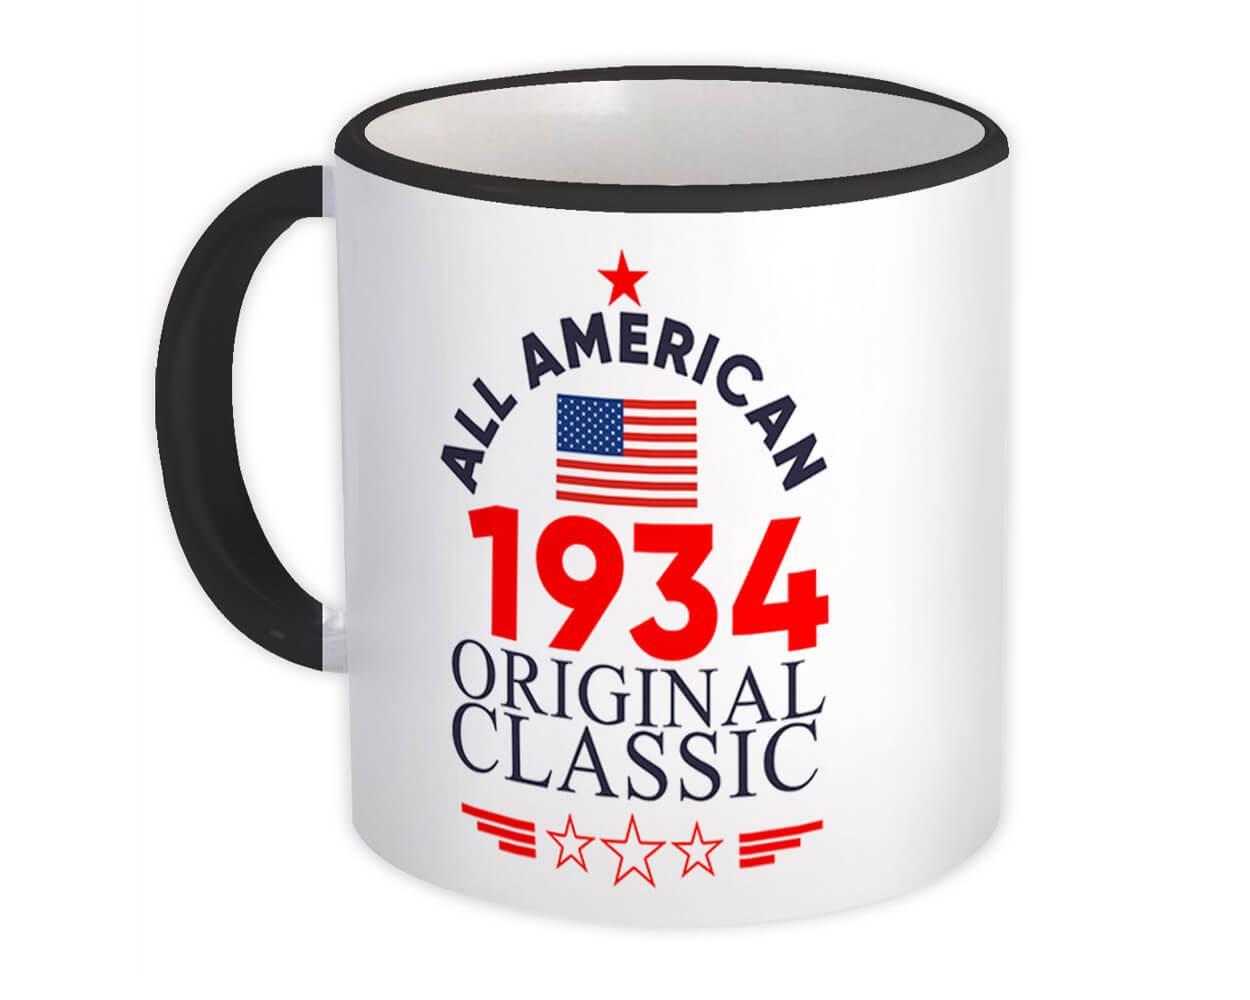 1934 Birthday : Gift Mug All American Original Classic Flag Patriotic Age USA